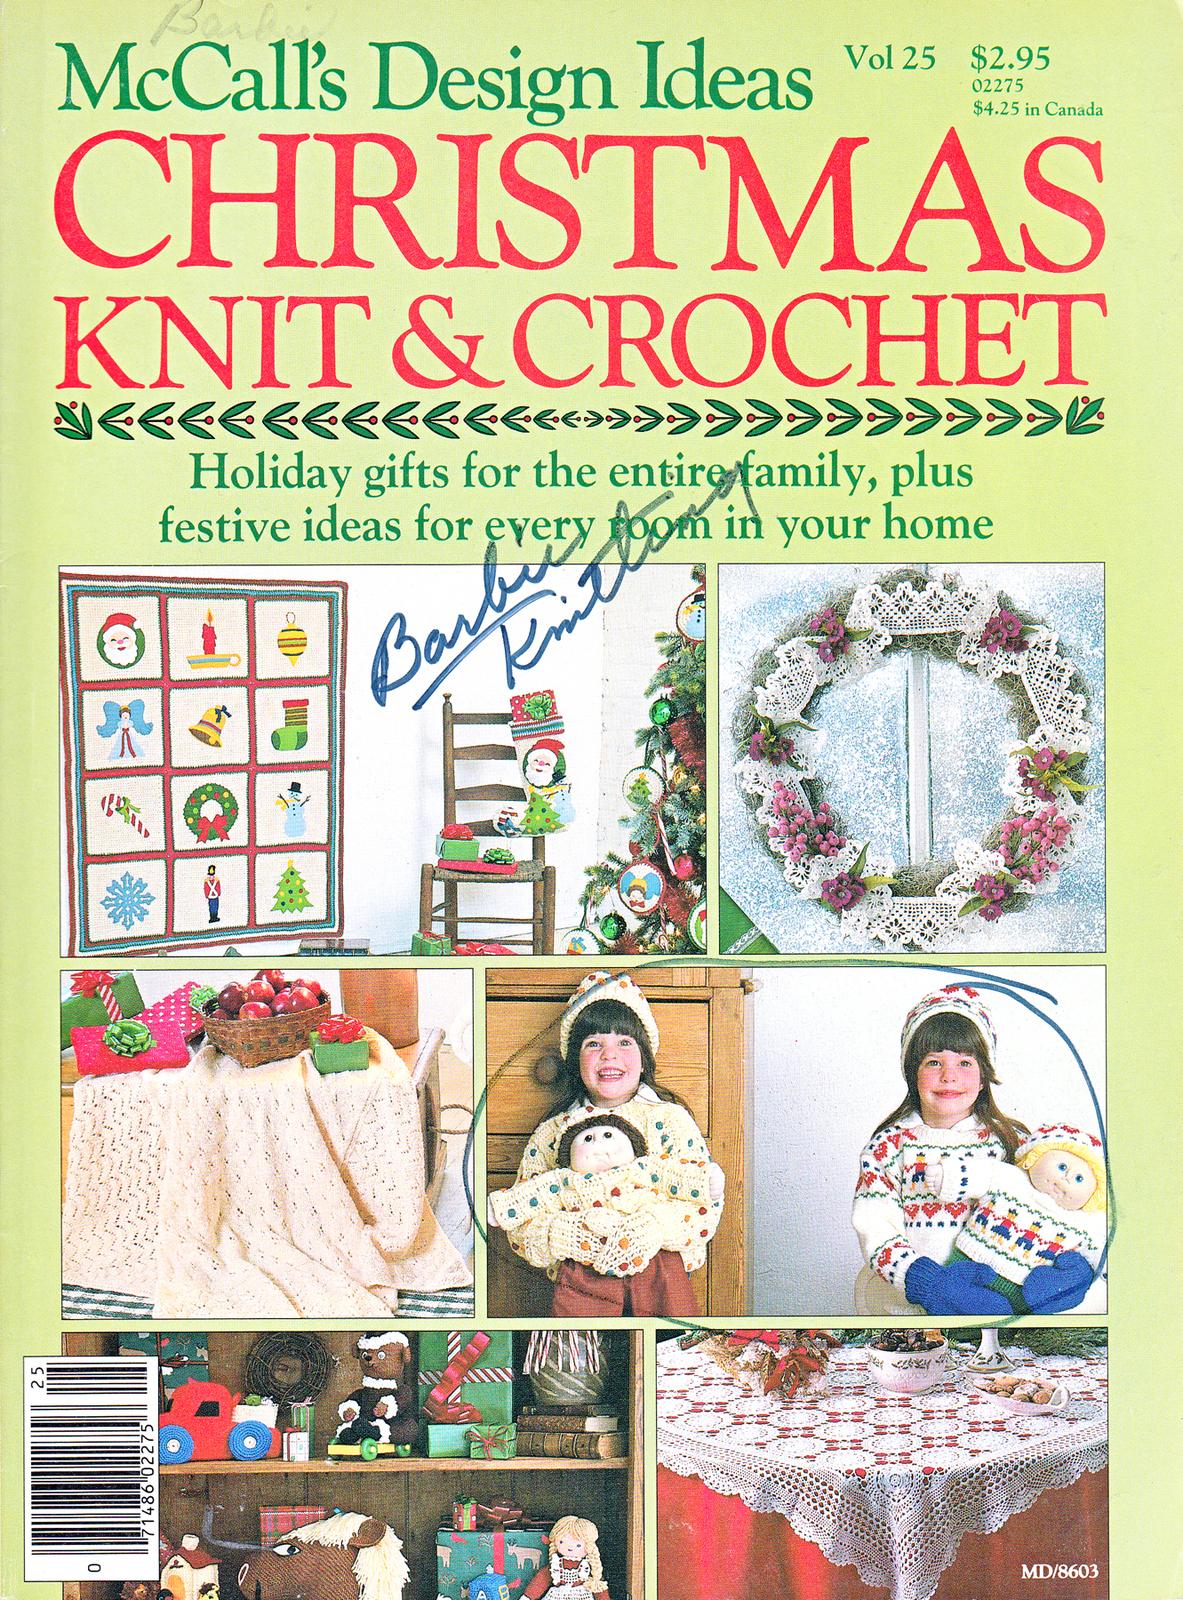 1986 MCCALLS CHRISTMAS KNIT CROCHET CPK BARBIE NUTCRACKER DOLL ORNAMENTS AFGHAN - $12.98